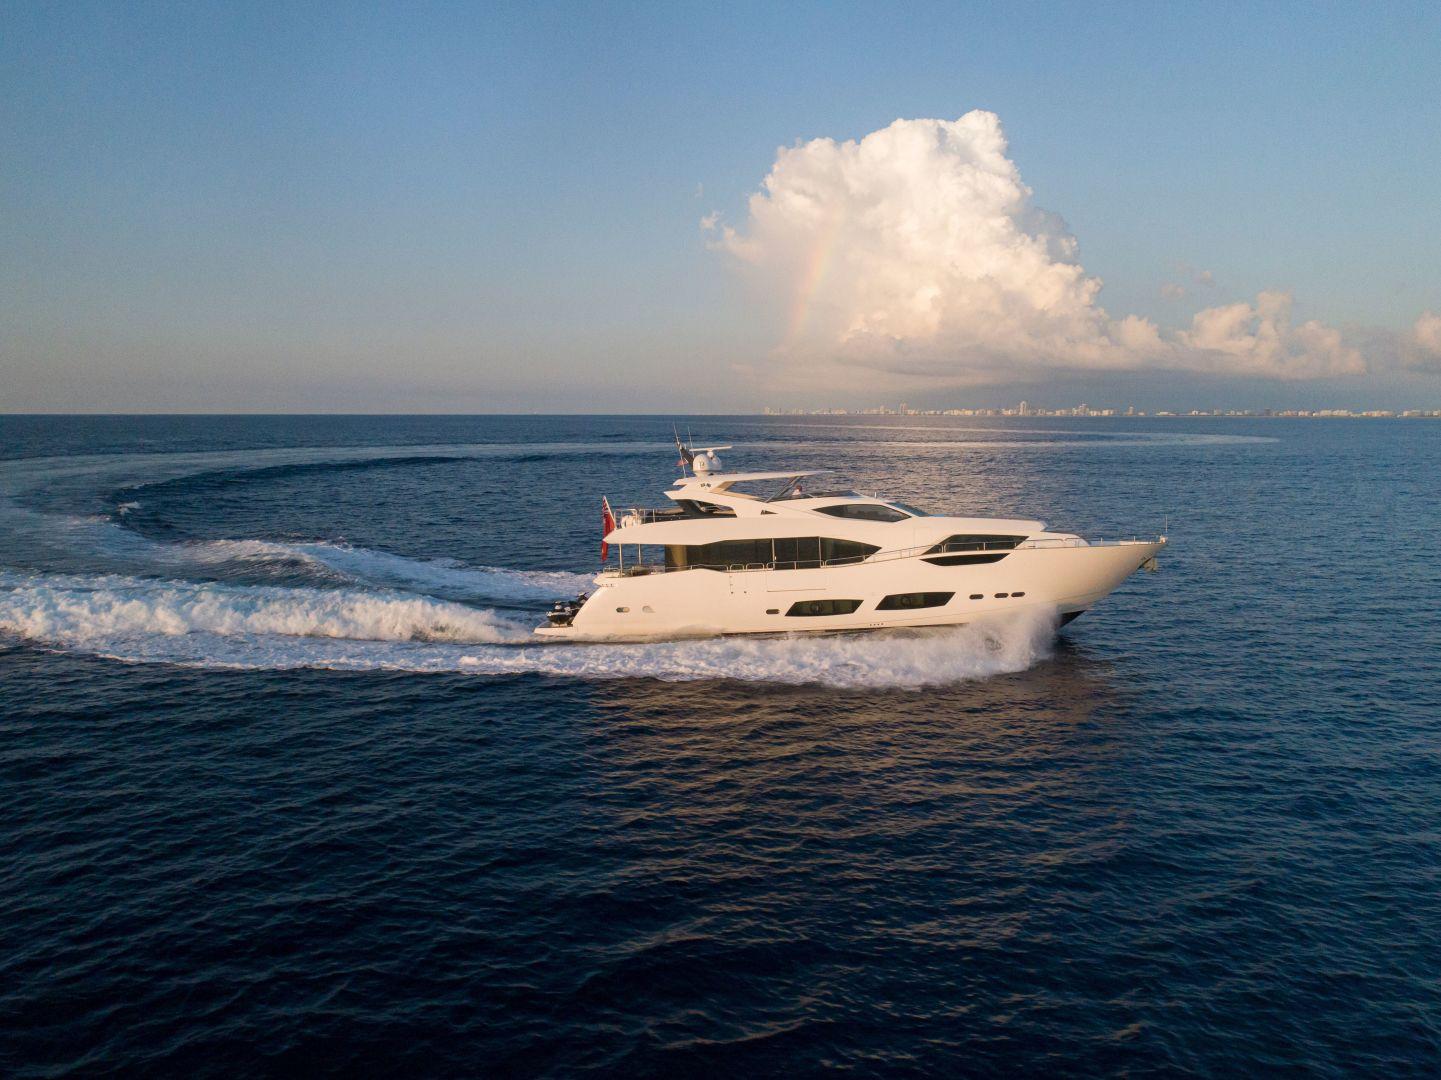 Sunseeker-95 Yacht 2017-Perseverance 3 Ft Lauderdale-Florida-United States-1400065   Thumbnail